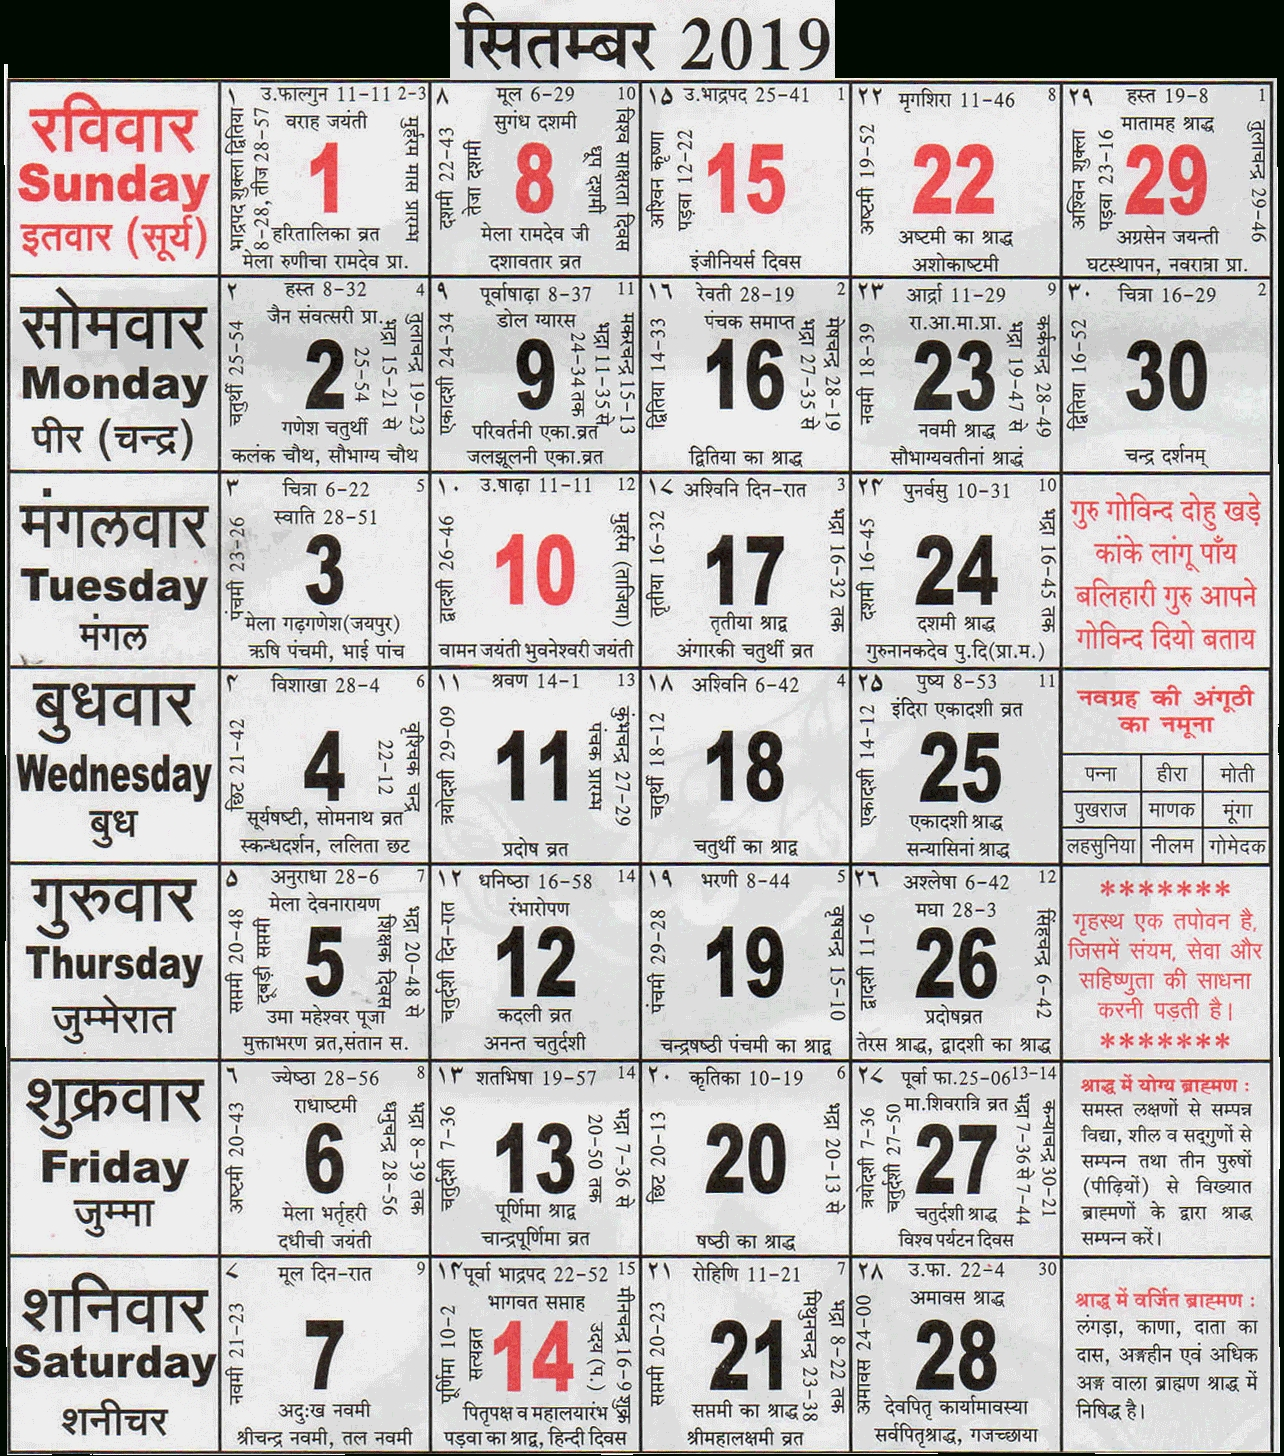 Hindi Monthly Calendar 2019 September | Year